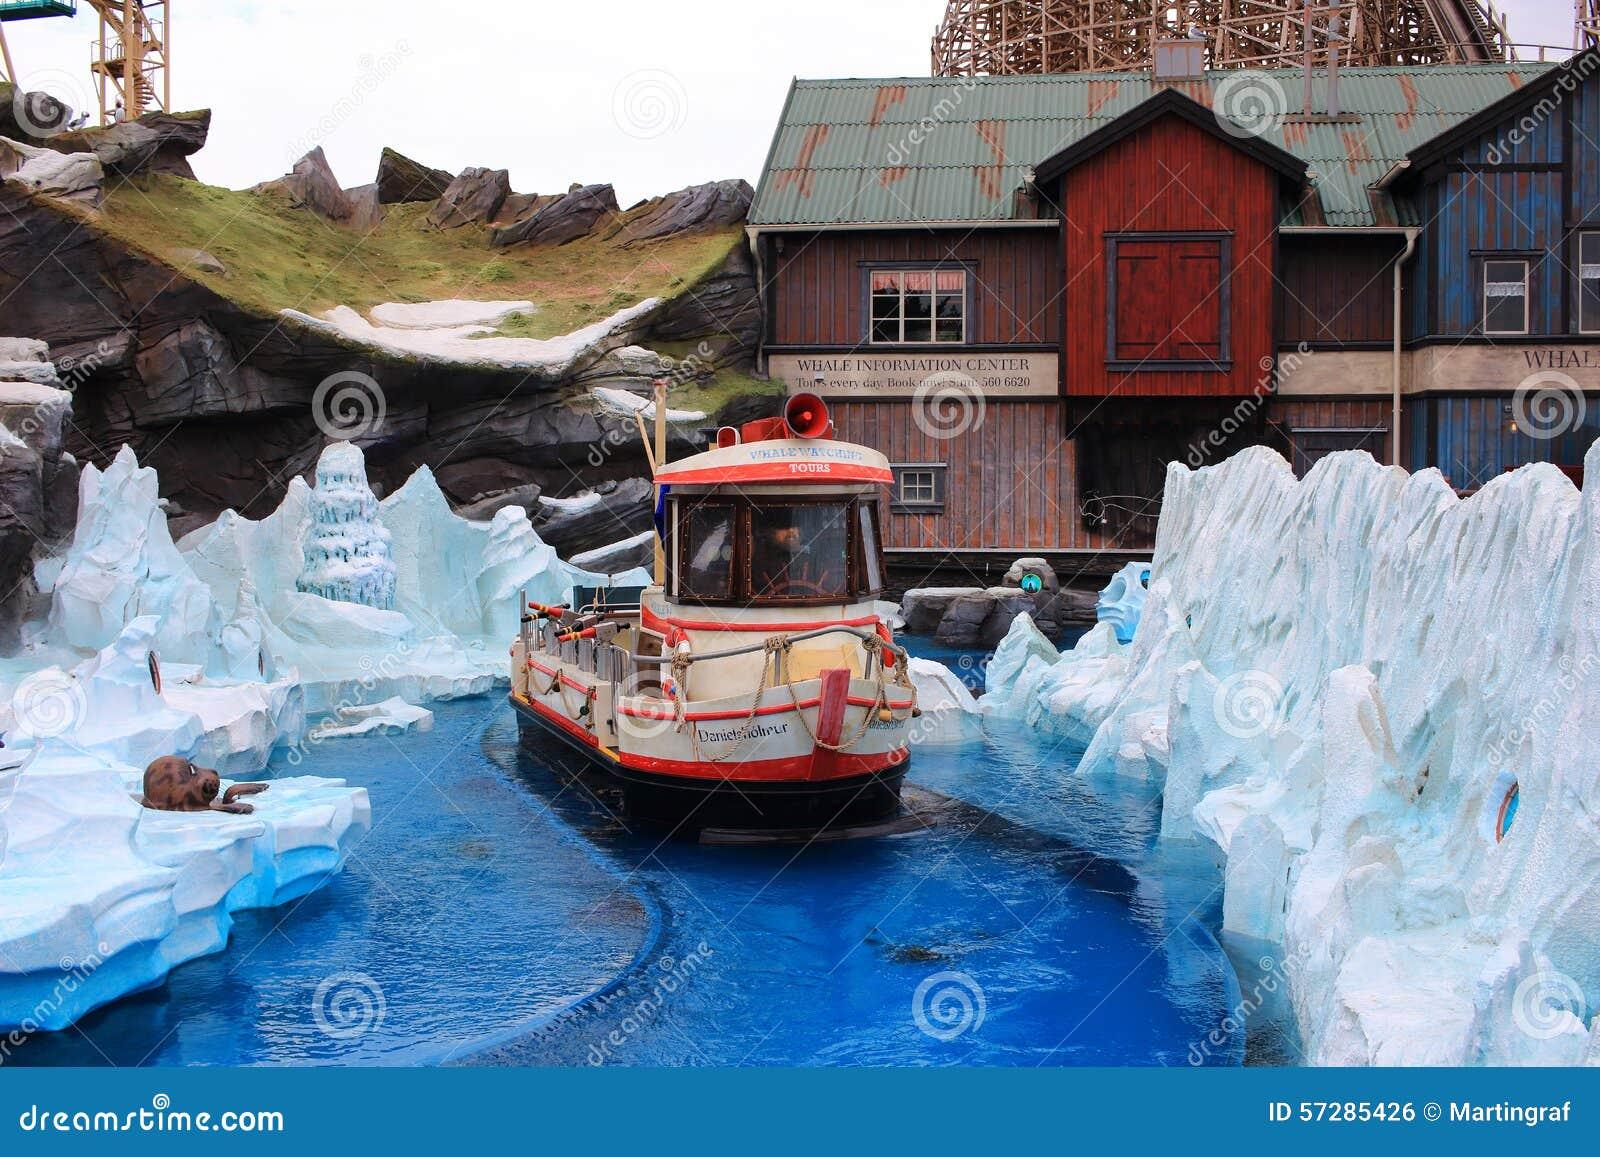 Boat Tour Icelandic Area Theme Park Editorial